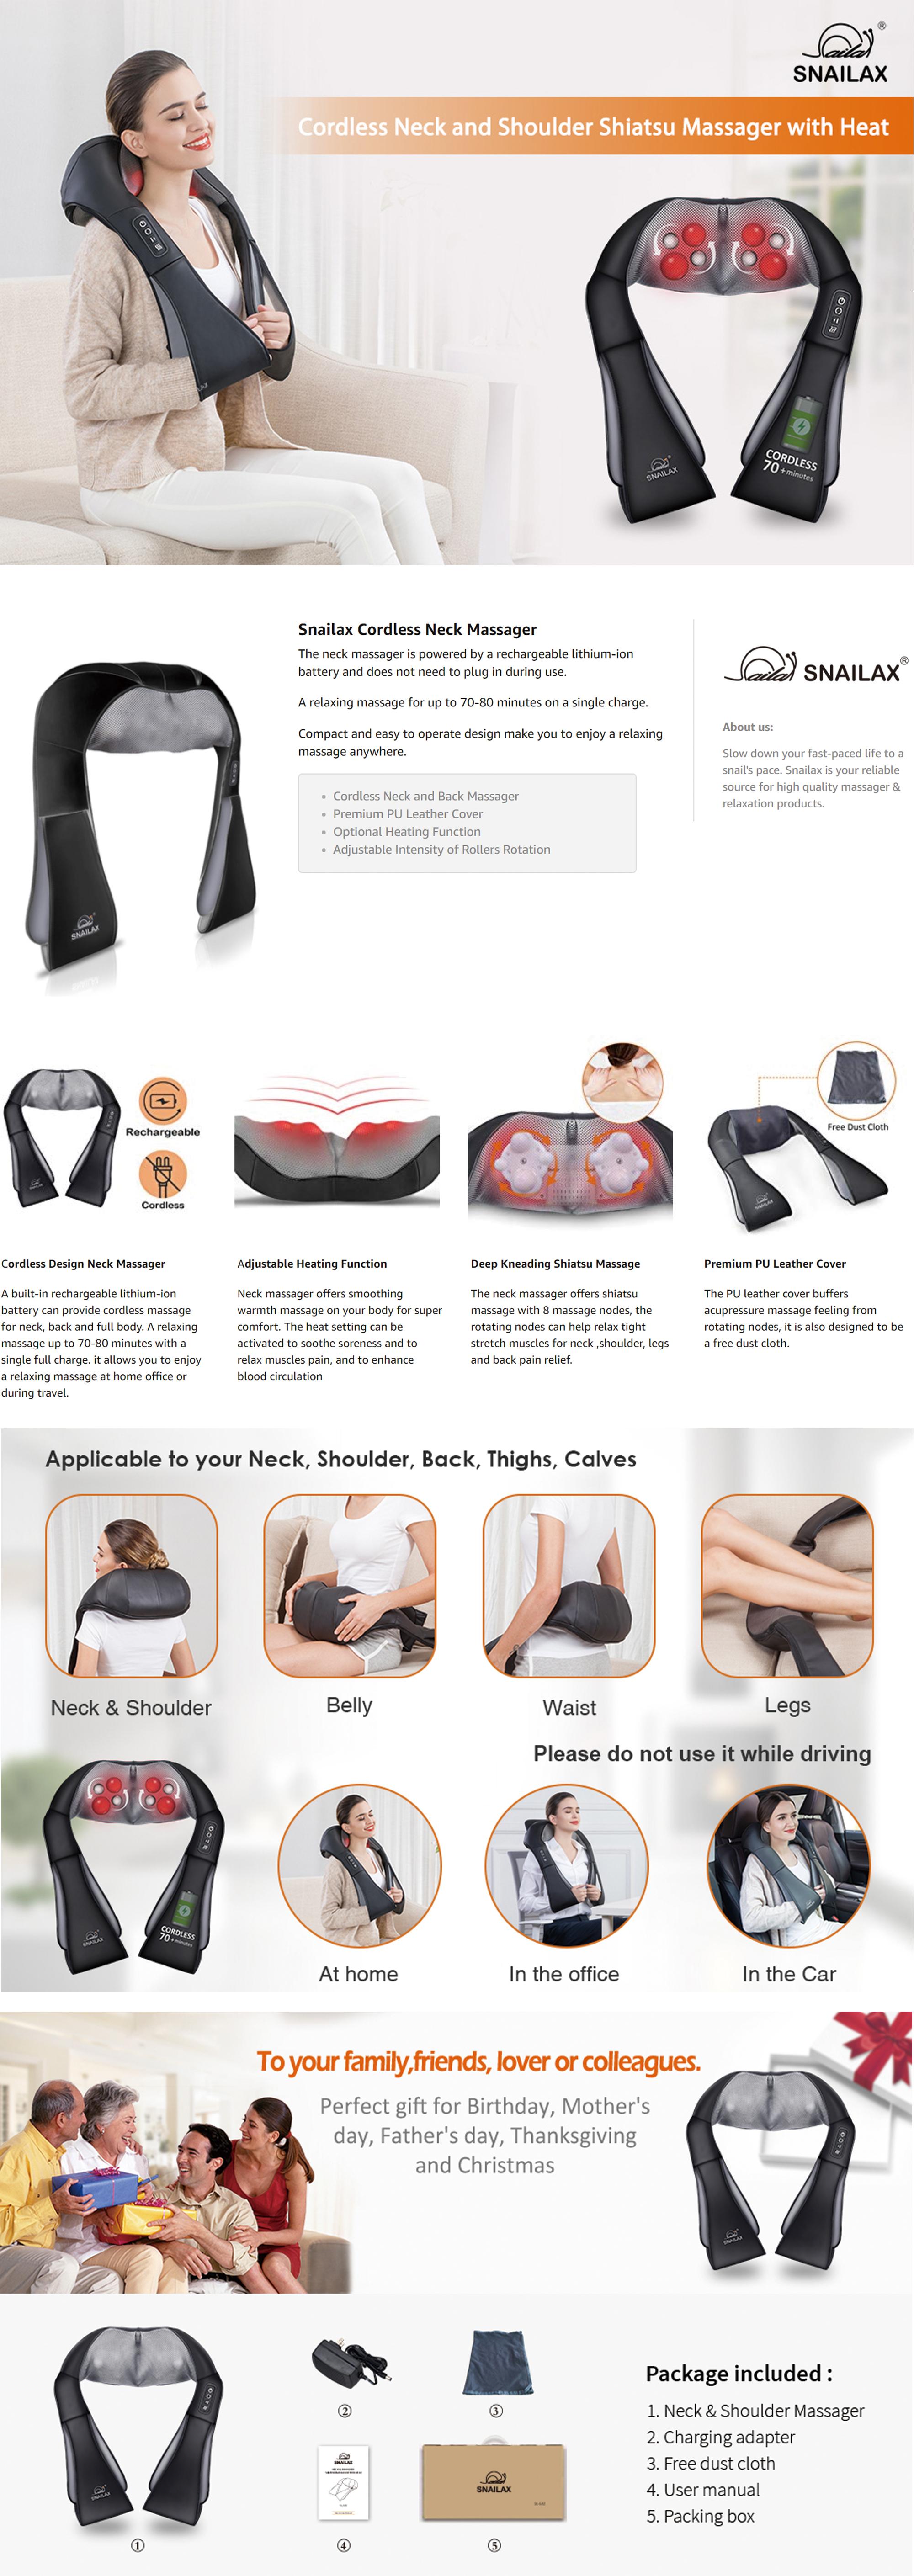 Snailax Shiatsu Cordless Portable Neck & Back Massager Features